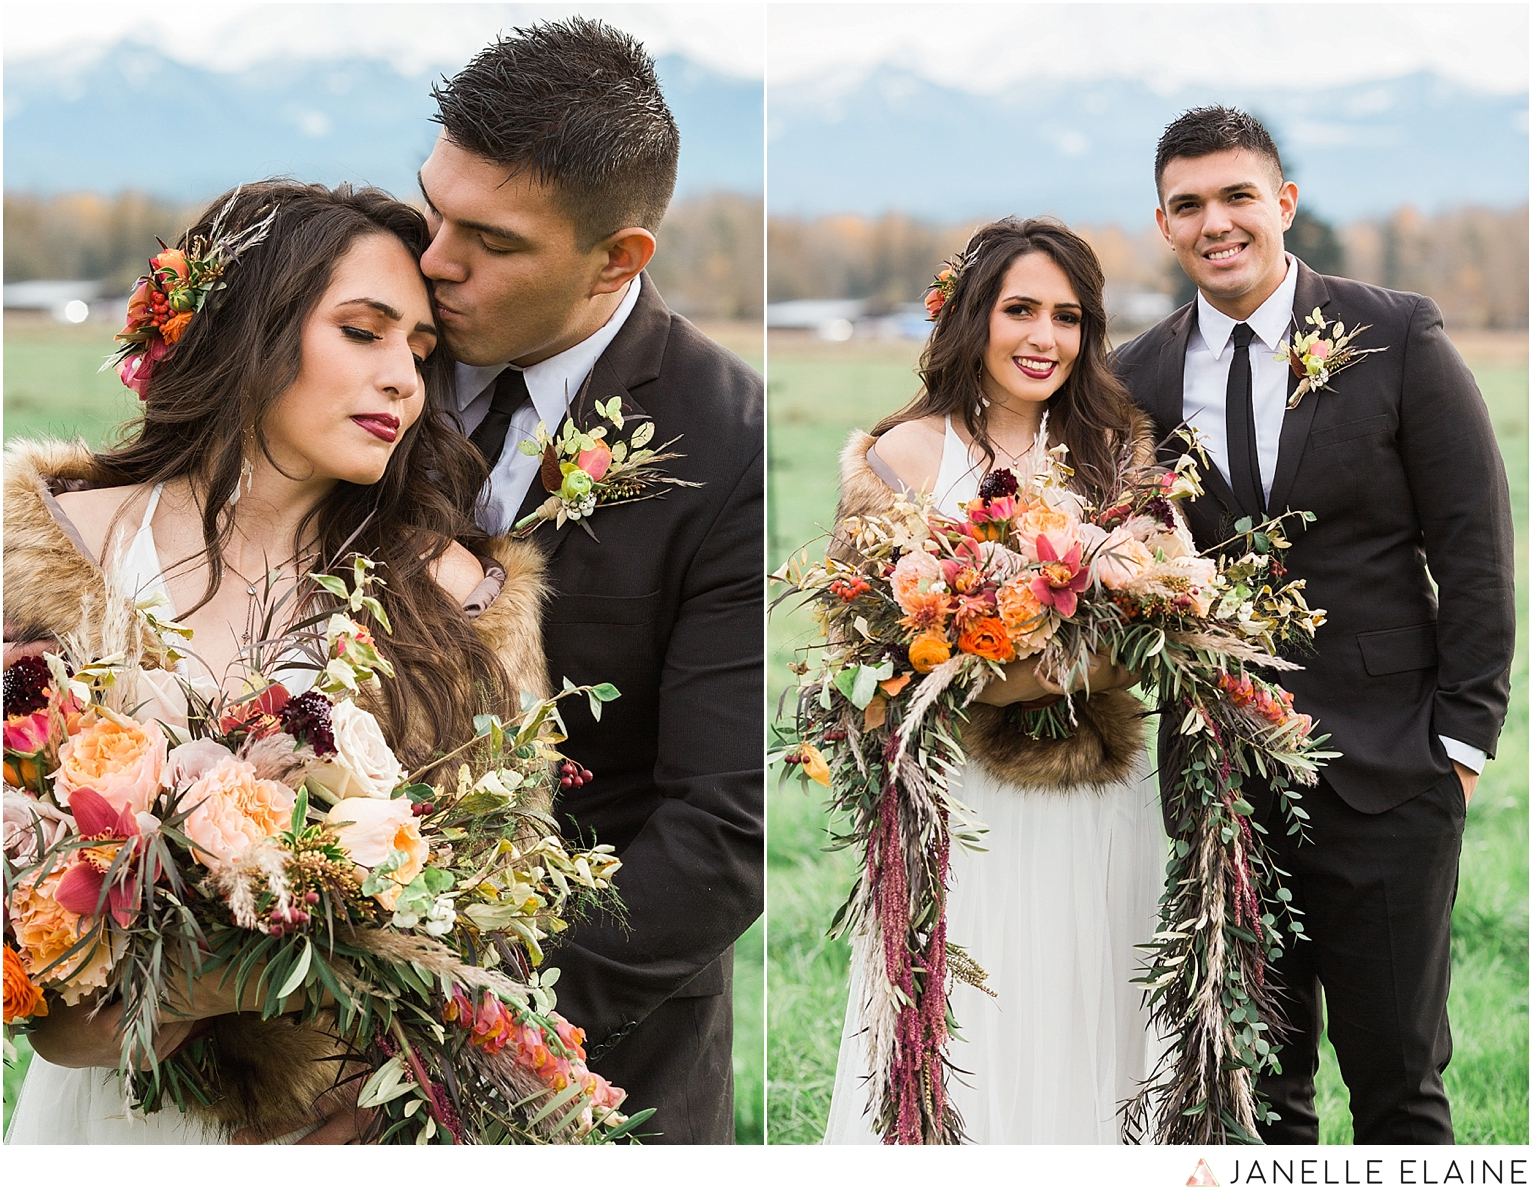 elopement-wedding-photographer-seattle washington-photographers-43.jpg